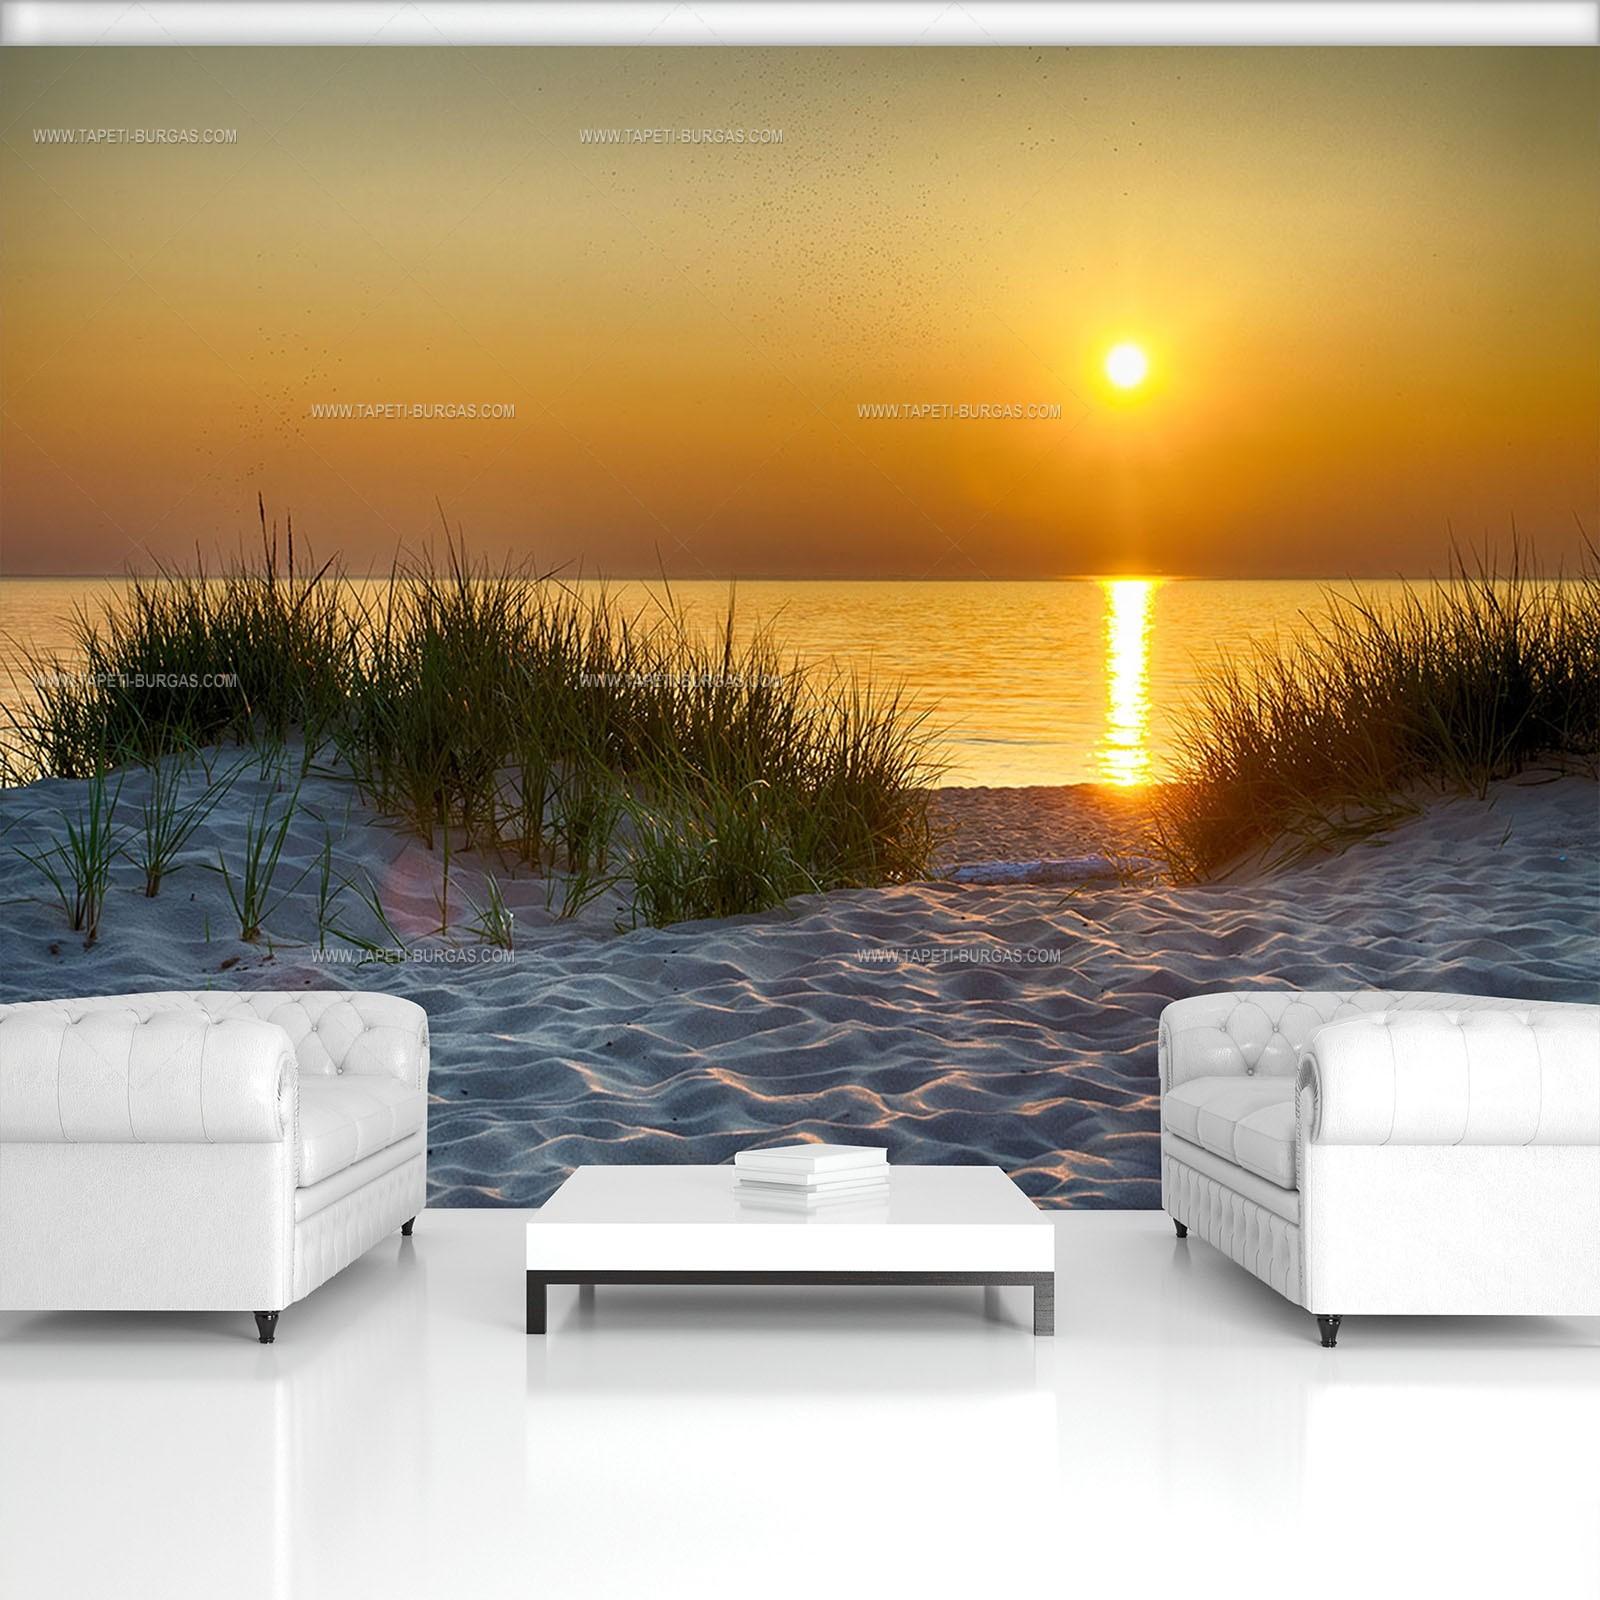 Фототапет Морски пейзаж